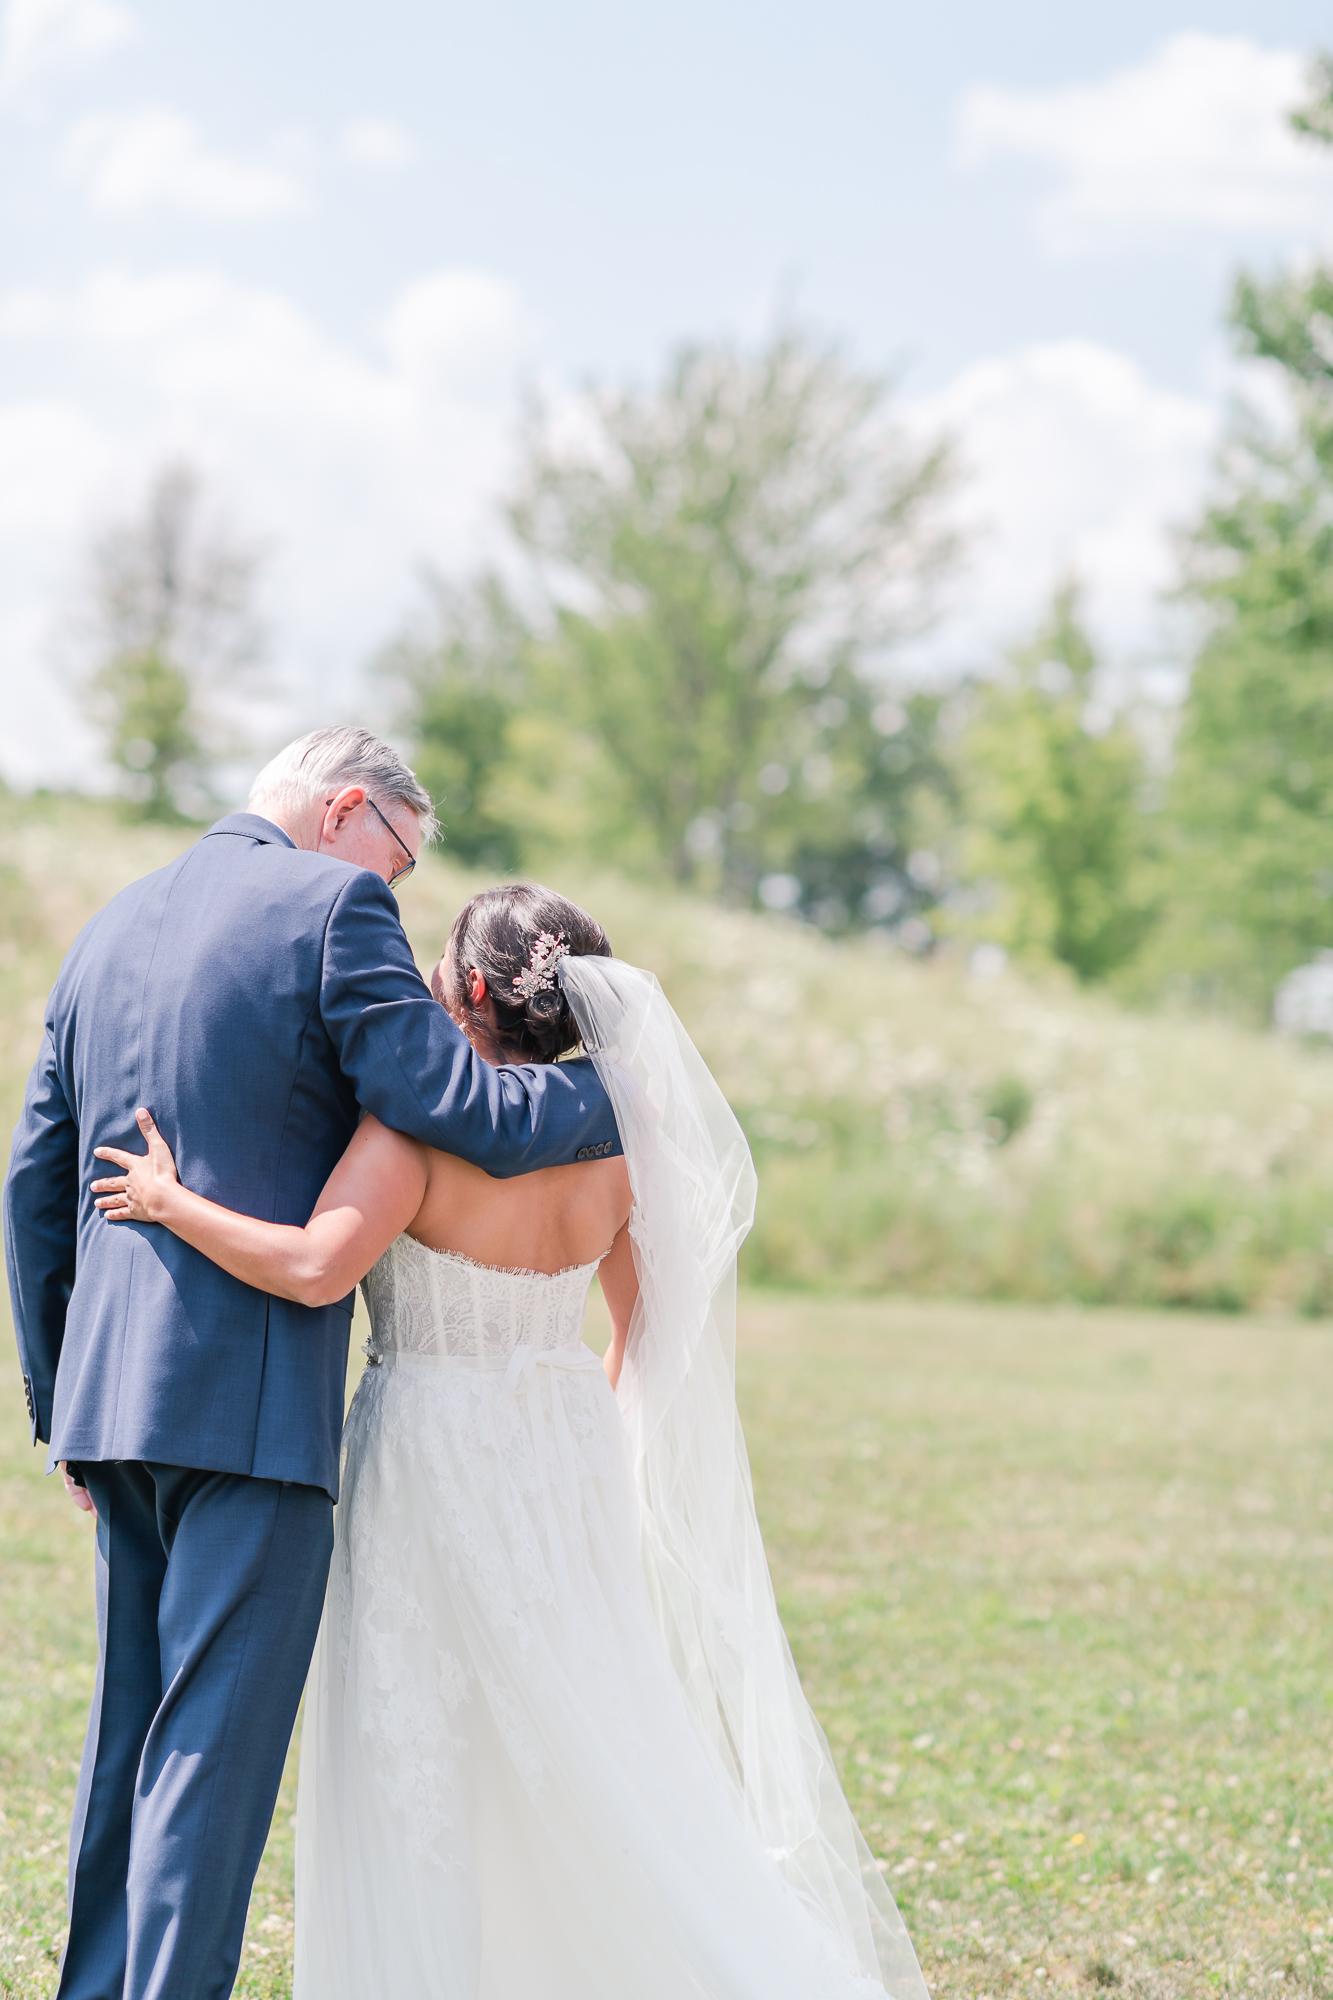 Maria+Adam_Summer Barn Wedding_The Barn at The North Star Preserve_Oberlin_Ohio-72.jpg